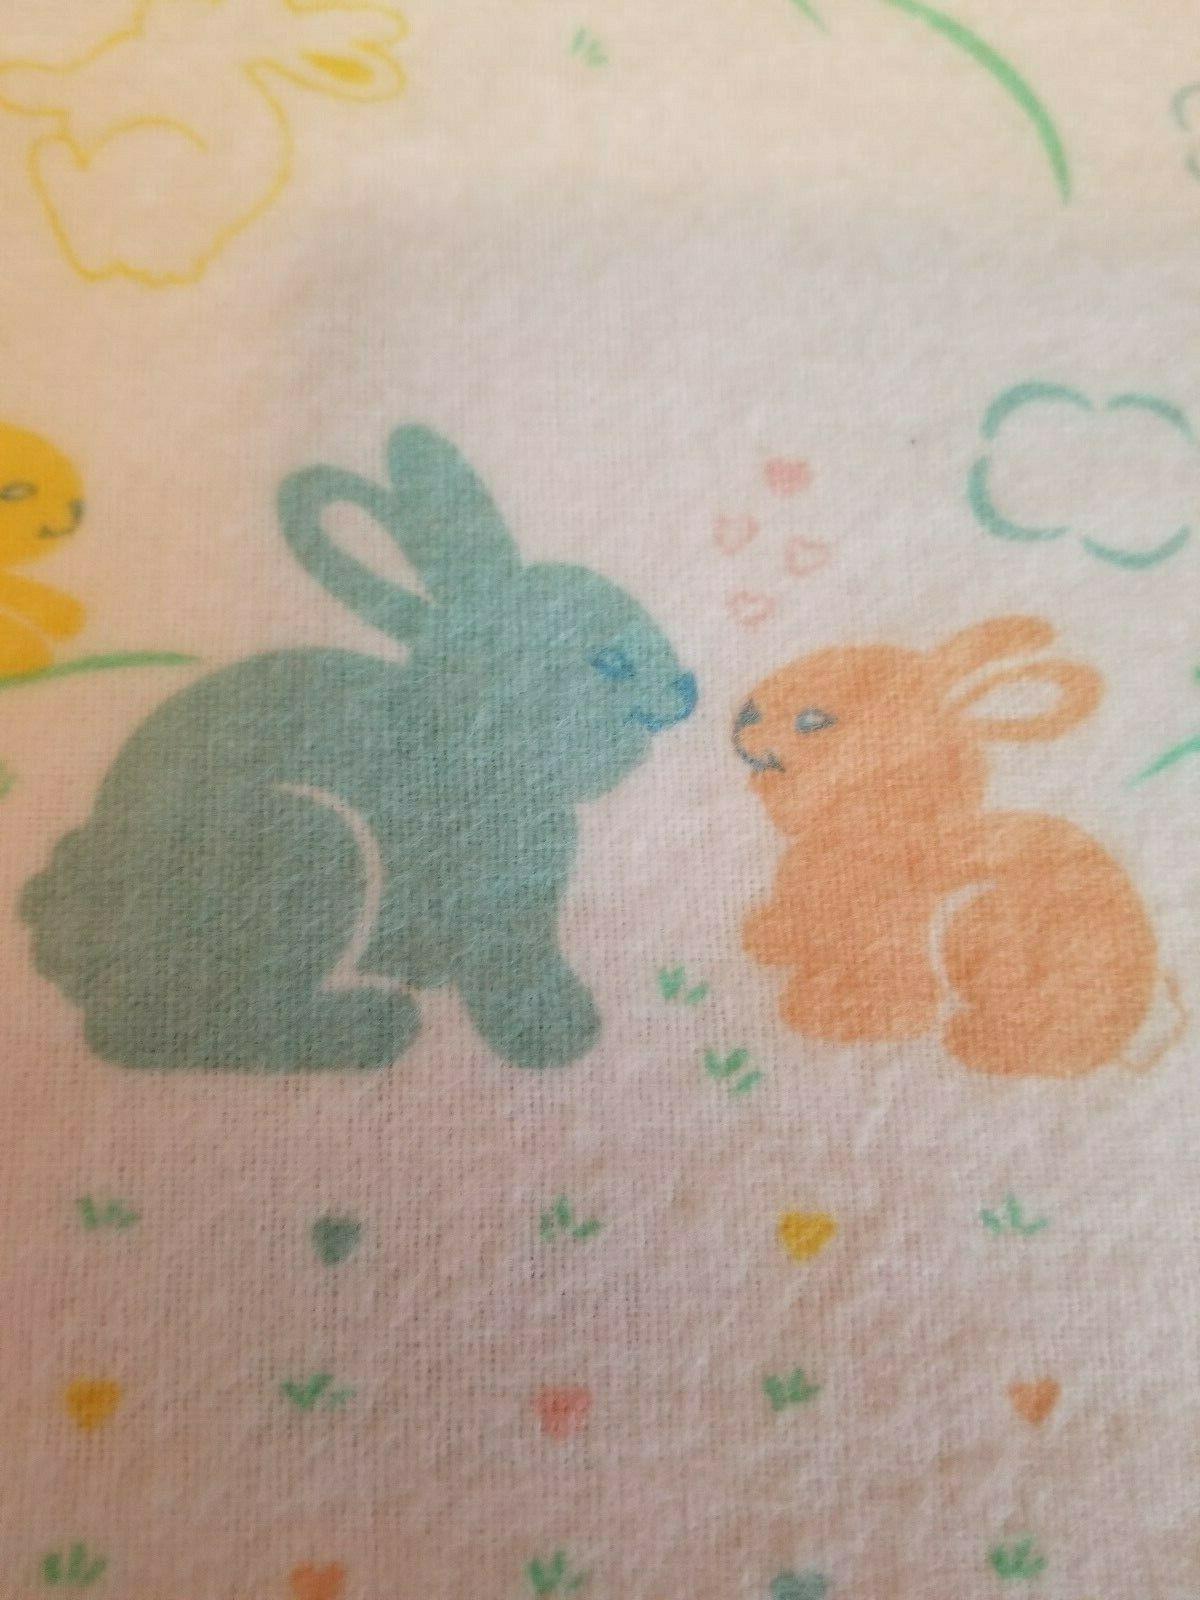 Vintage Bunny Rabbits Baby Receiving Blanket Flannel Cotton